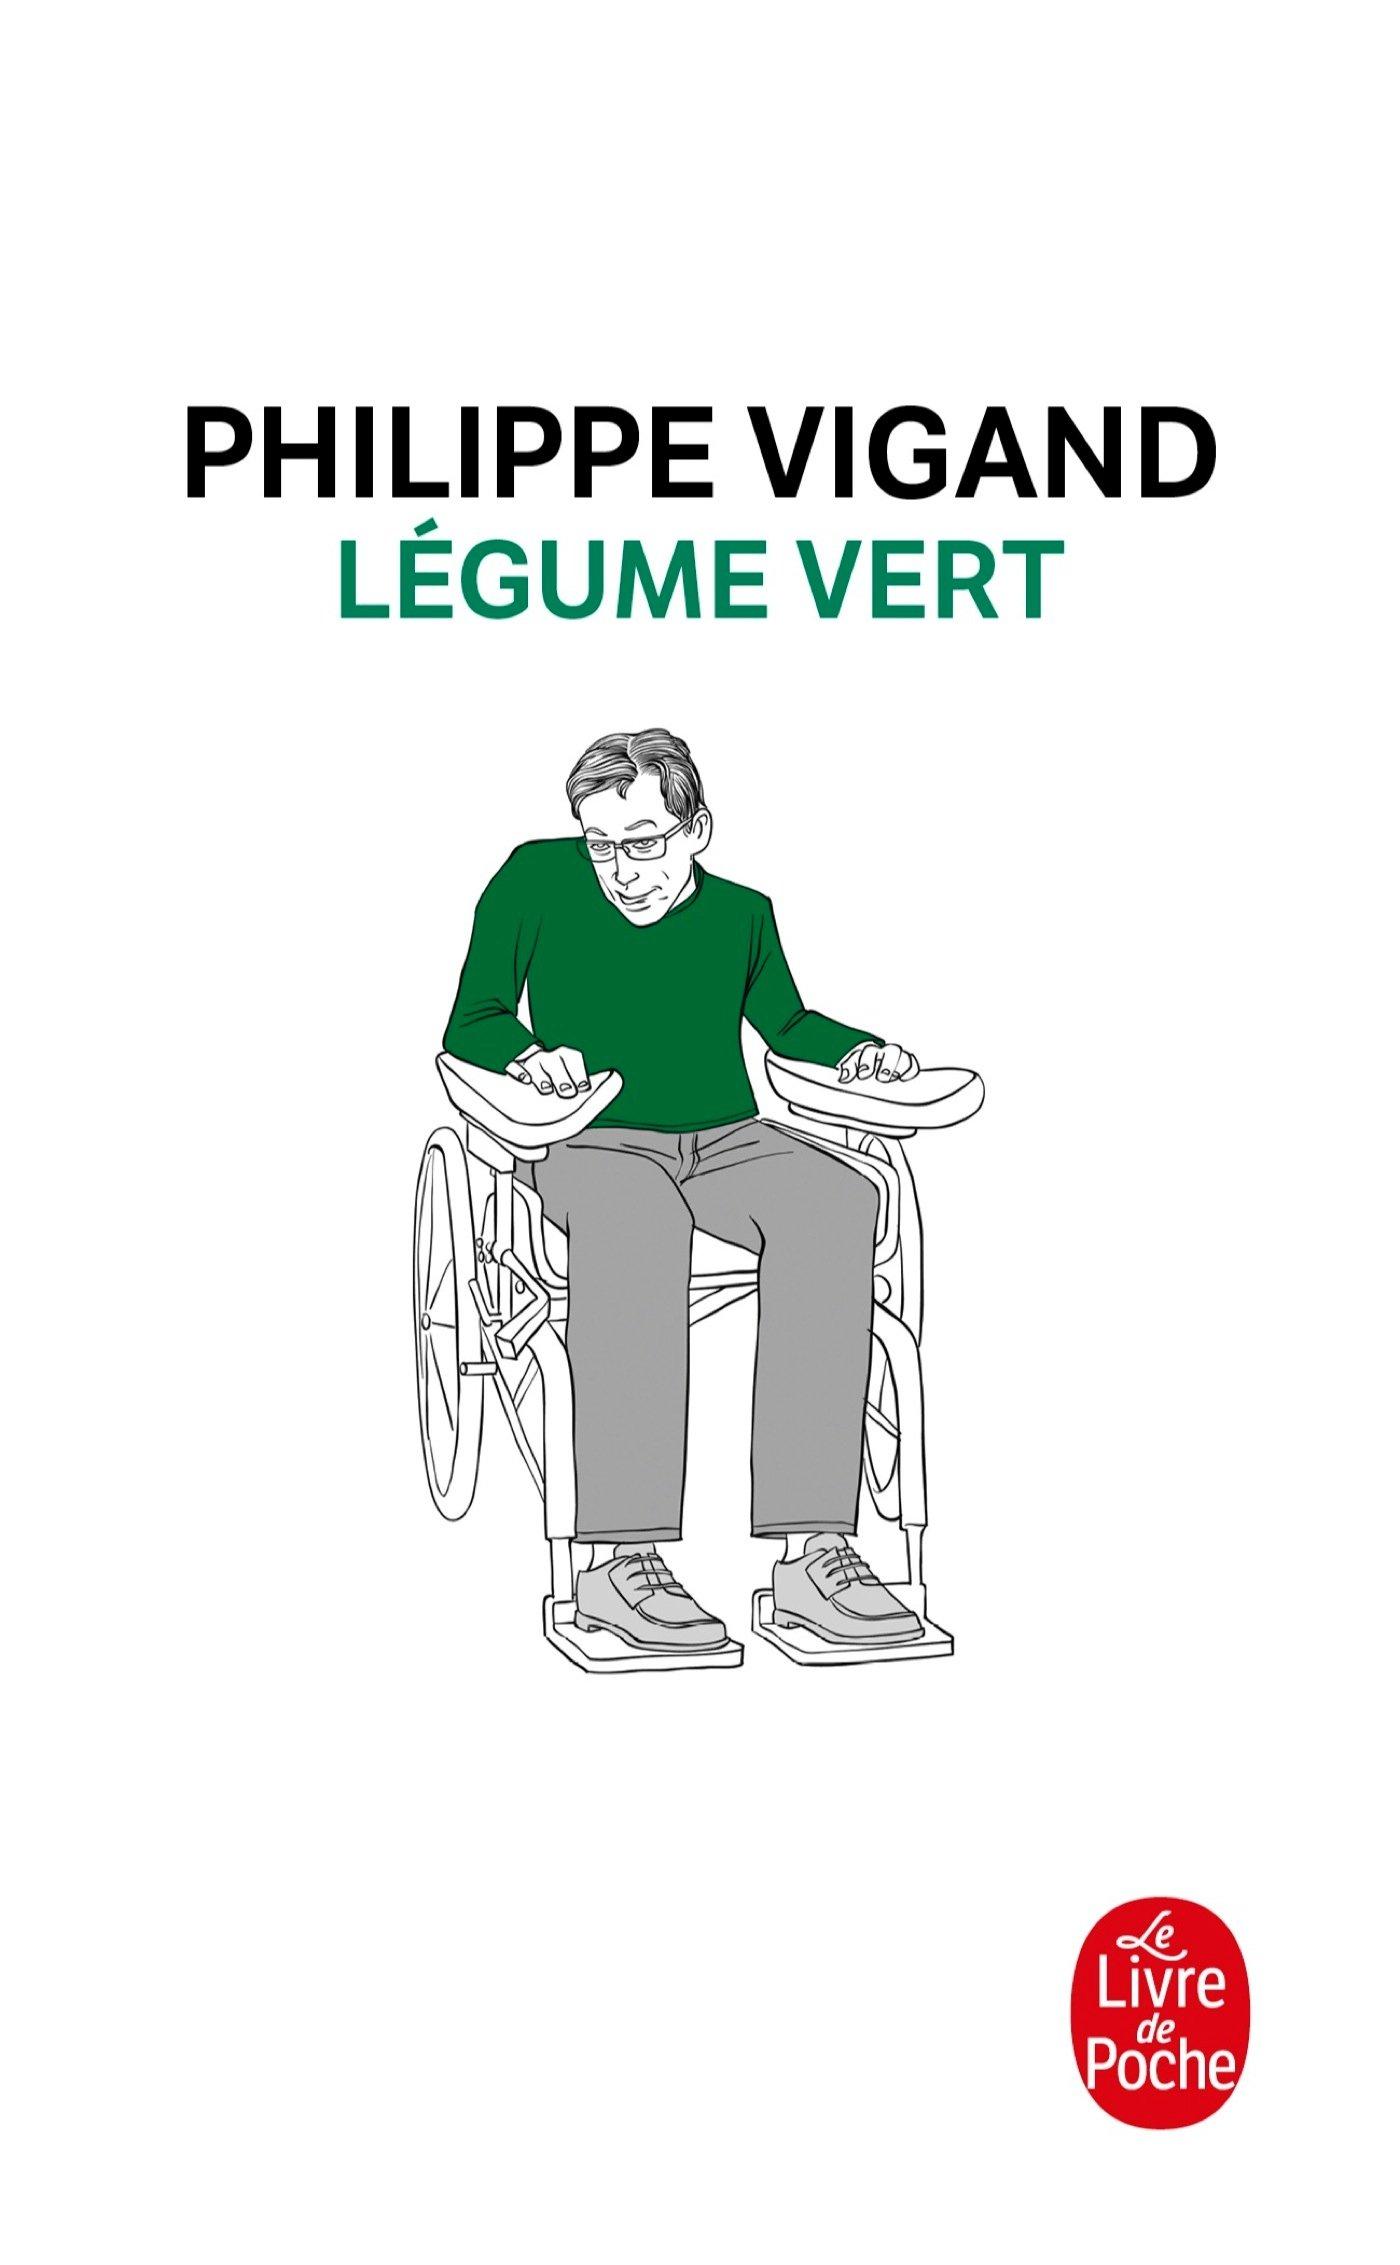 Amazon.fr - Légume vert - Vigand, Philippe - Livres